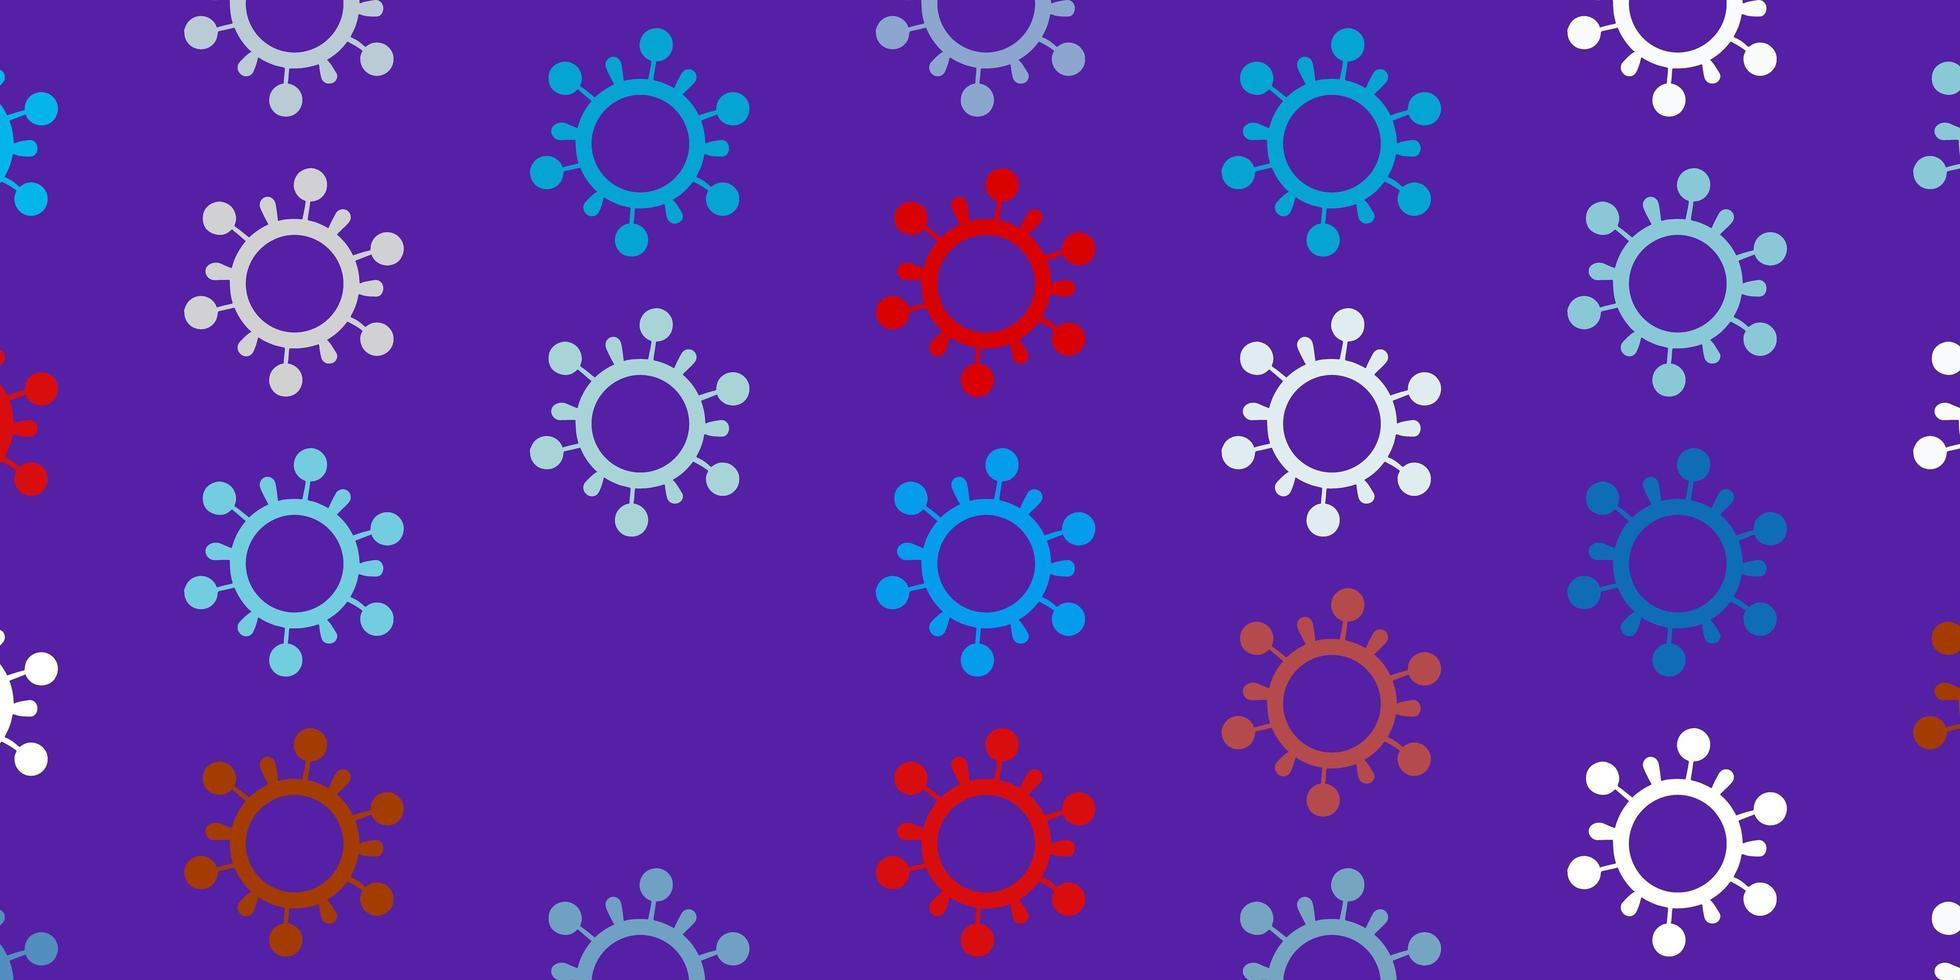 patrón de vector azul claro, rojo con elementos de coronavirus.